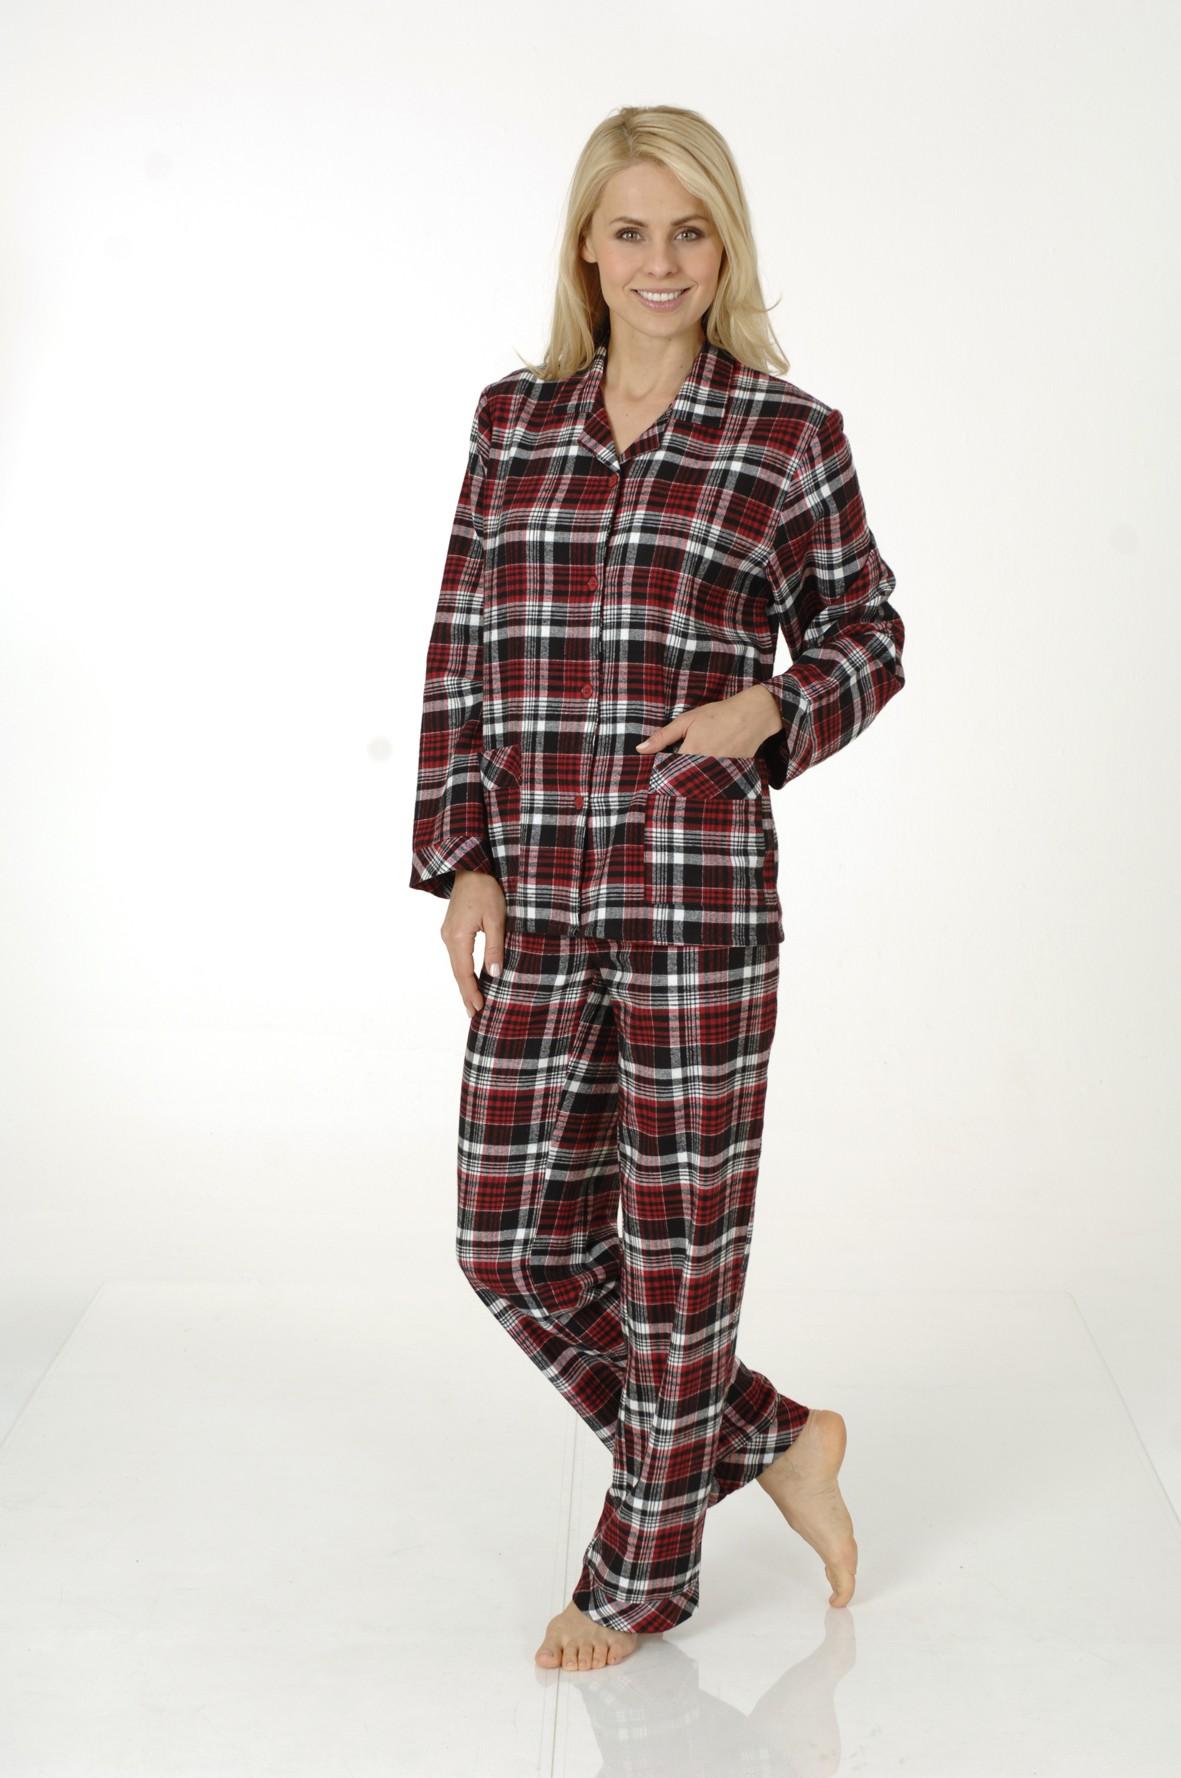 Damen Flanell Pyjama, Karo Look, 53402  001